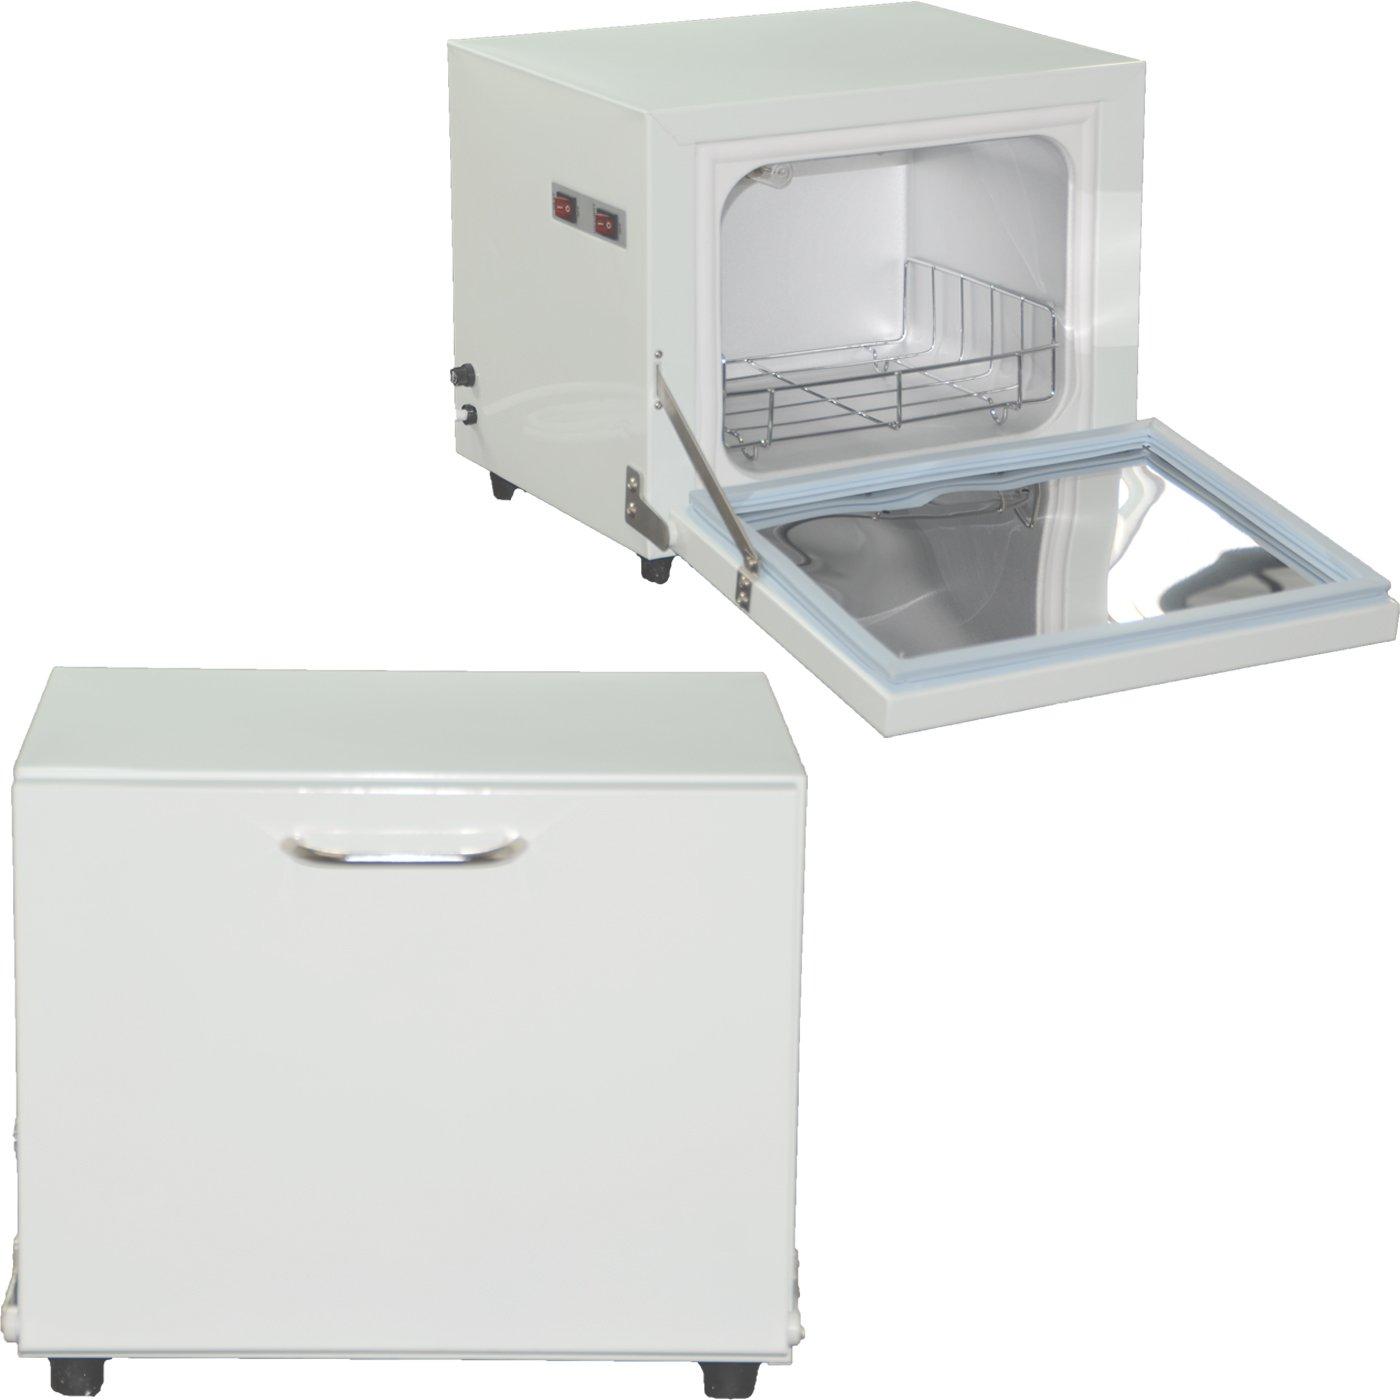 Compact 2-in-1 Towel Warmer & Ultraviolet Sterilizer Cabinet